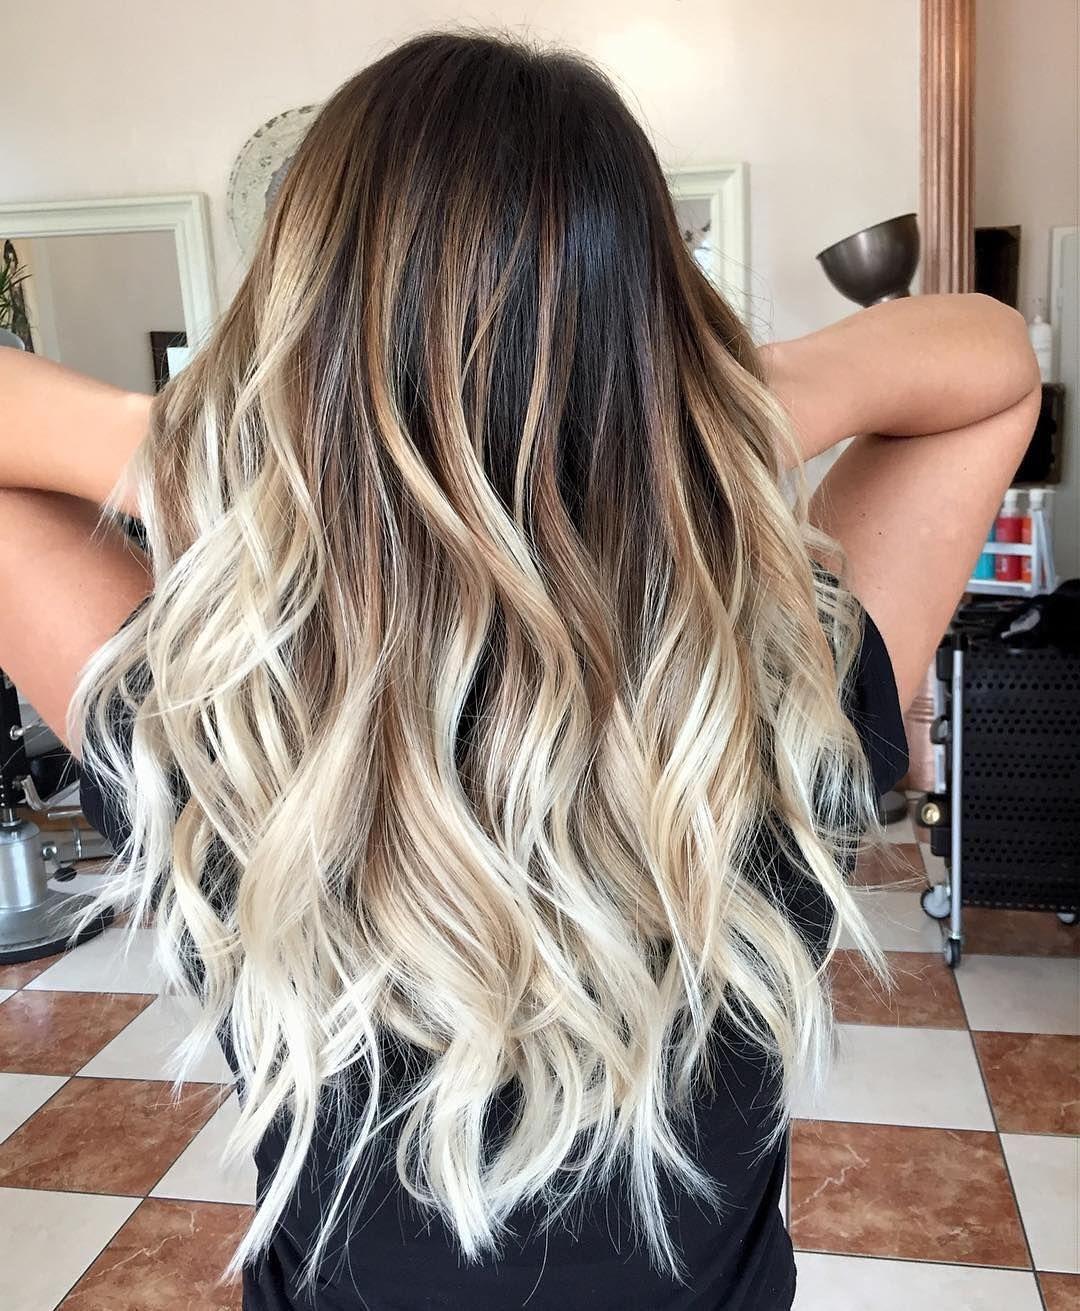 10 Medium Length Hair Color Ideas 2020 Hair Styles Brown Hair With Blonde Highlights Best Ombre Hair